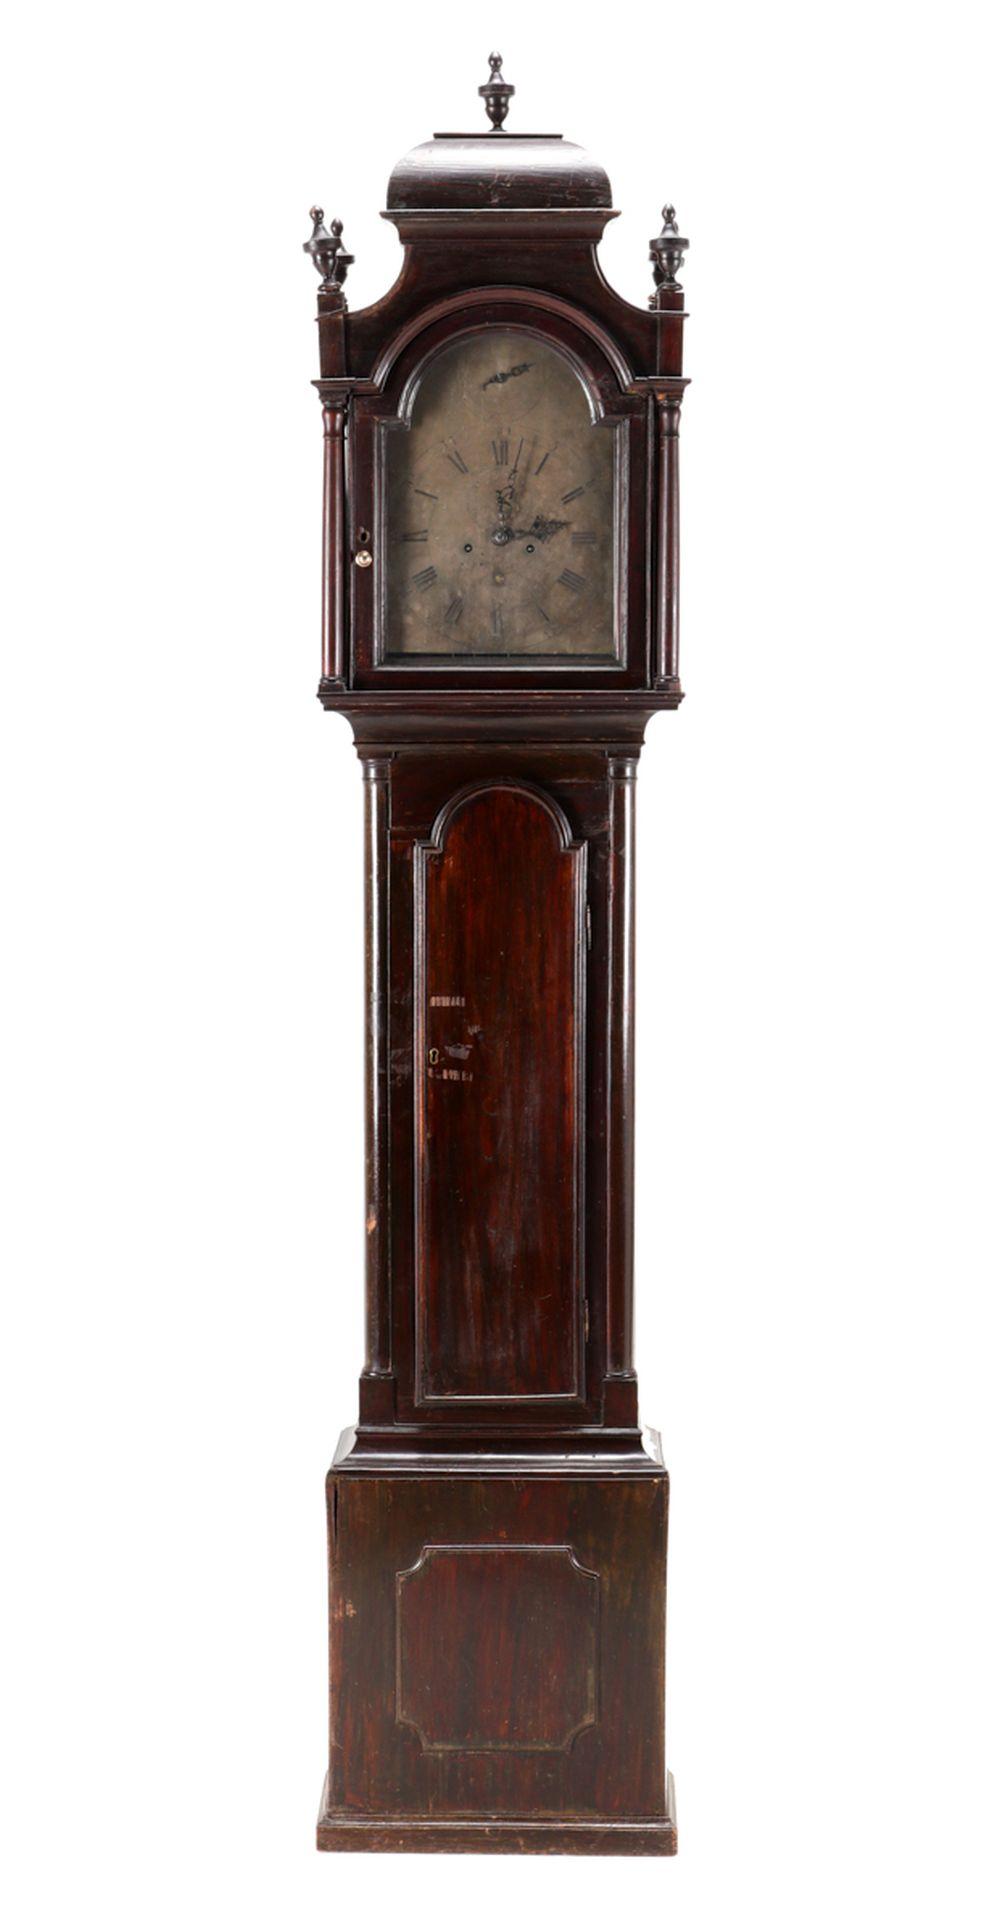 A GEORGE III LONGCASE CLOCK